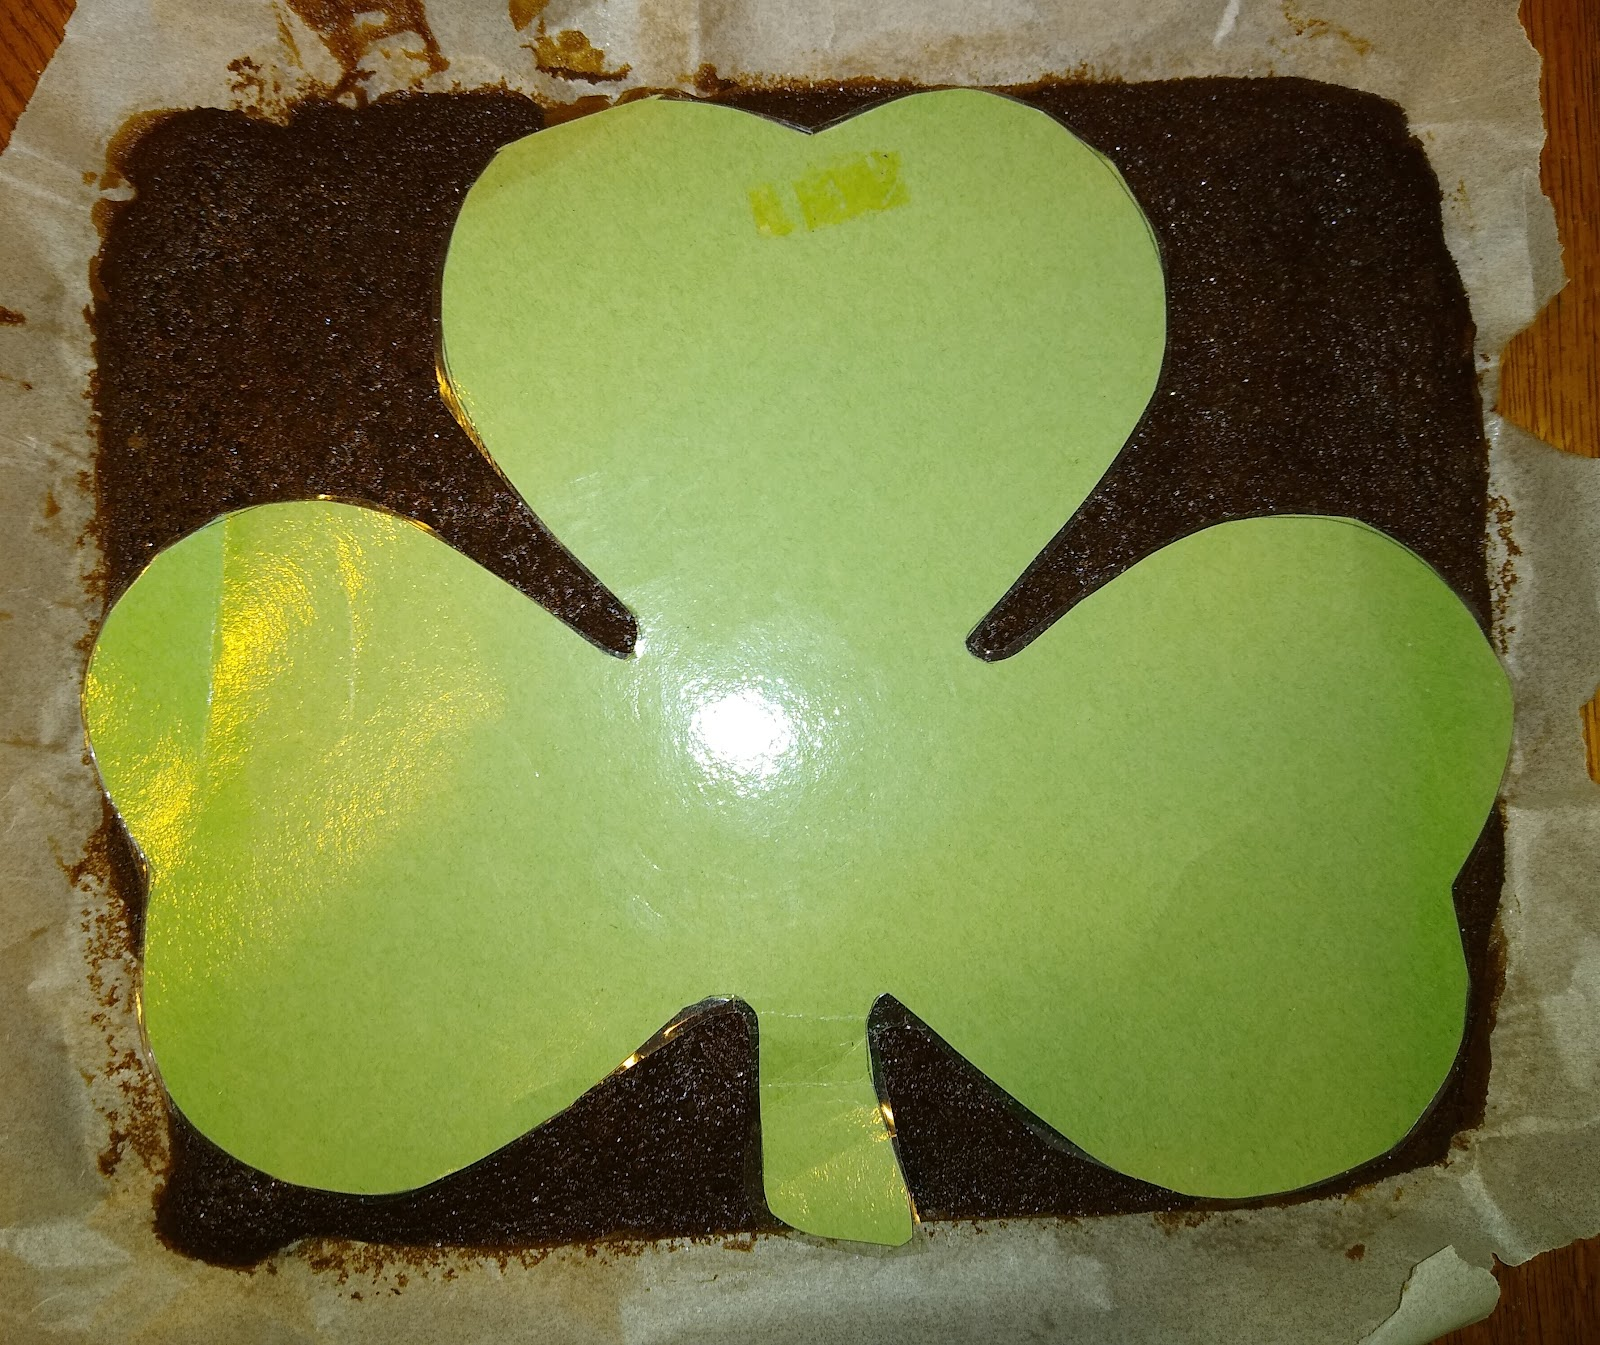 Shamrock cake picture